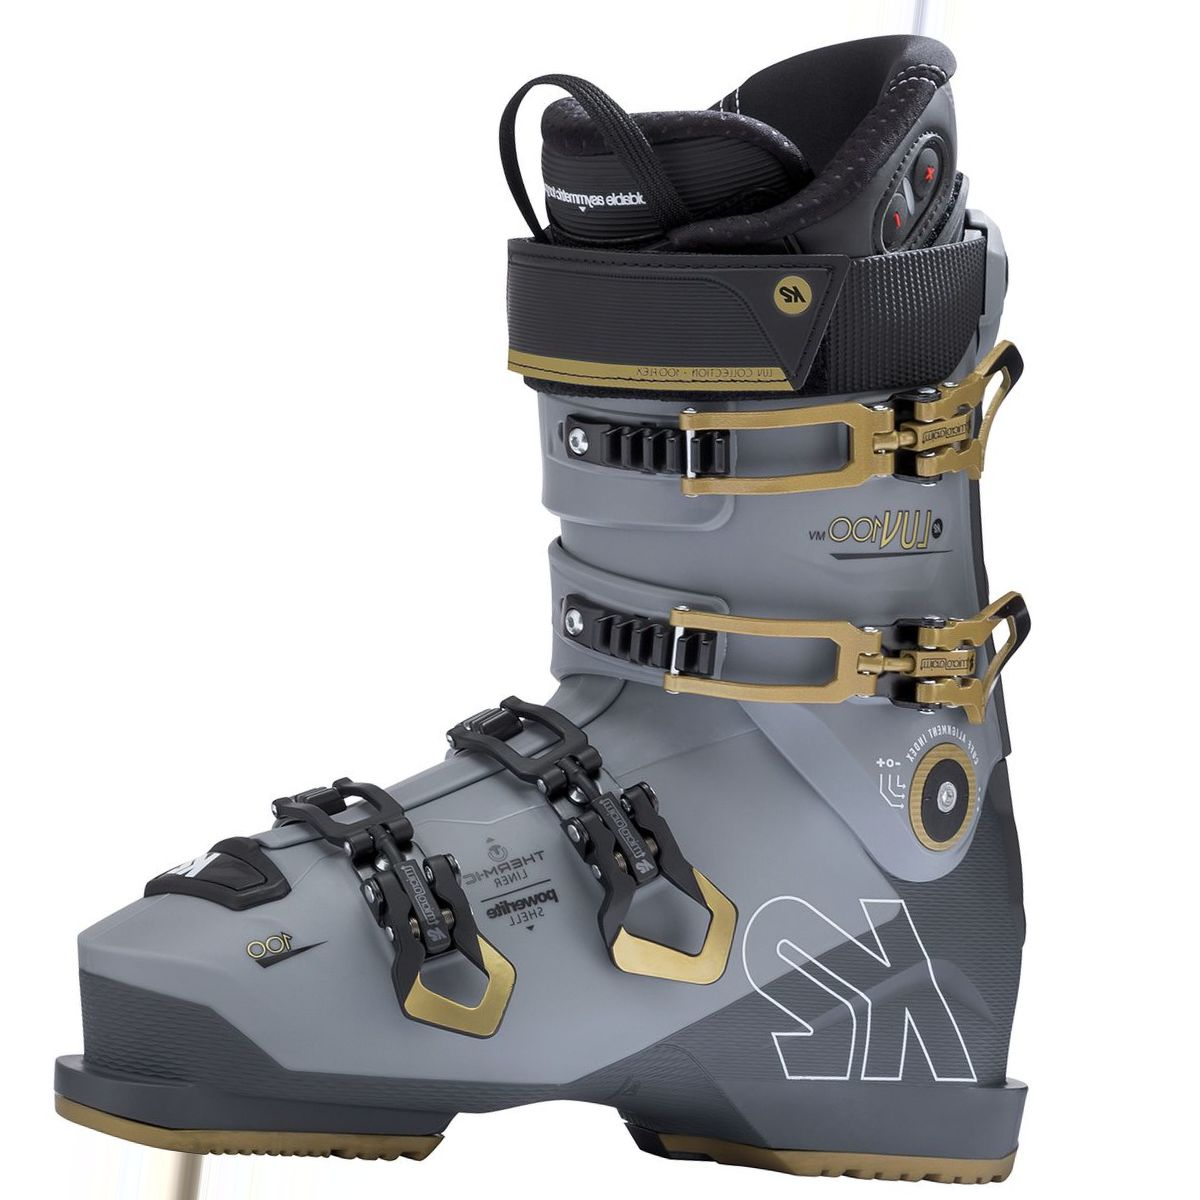 K2 Luv 100 MV Heat Ski Boot - Women's